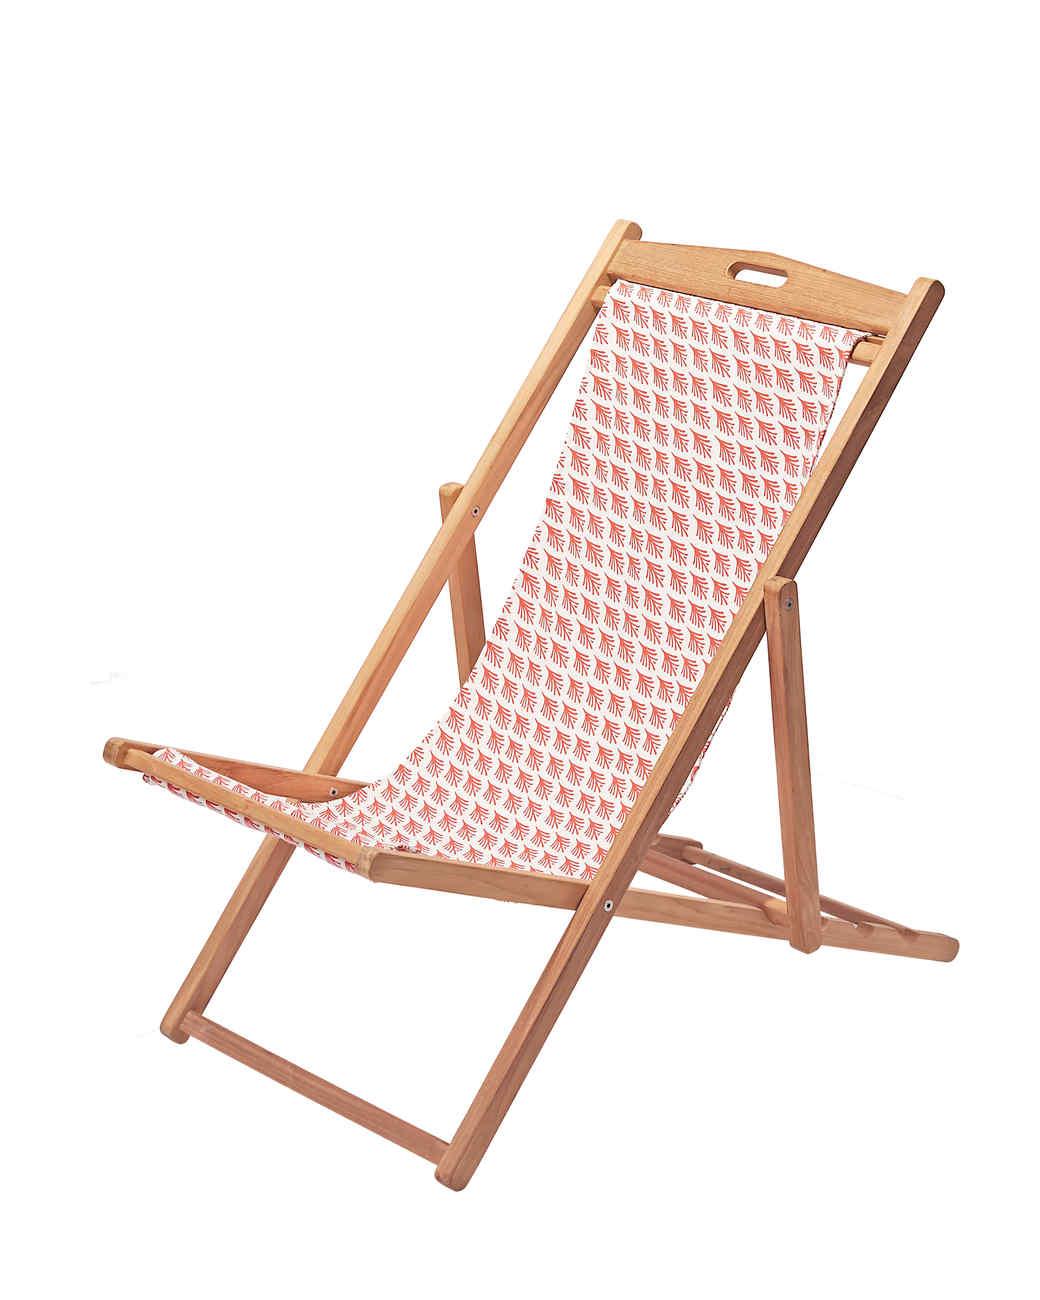 folding-chair-051-d111130.jpg